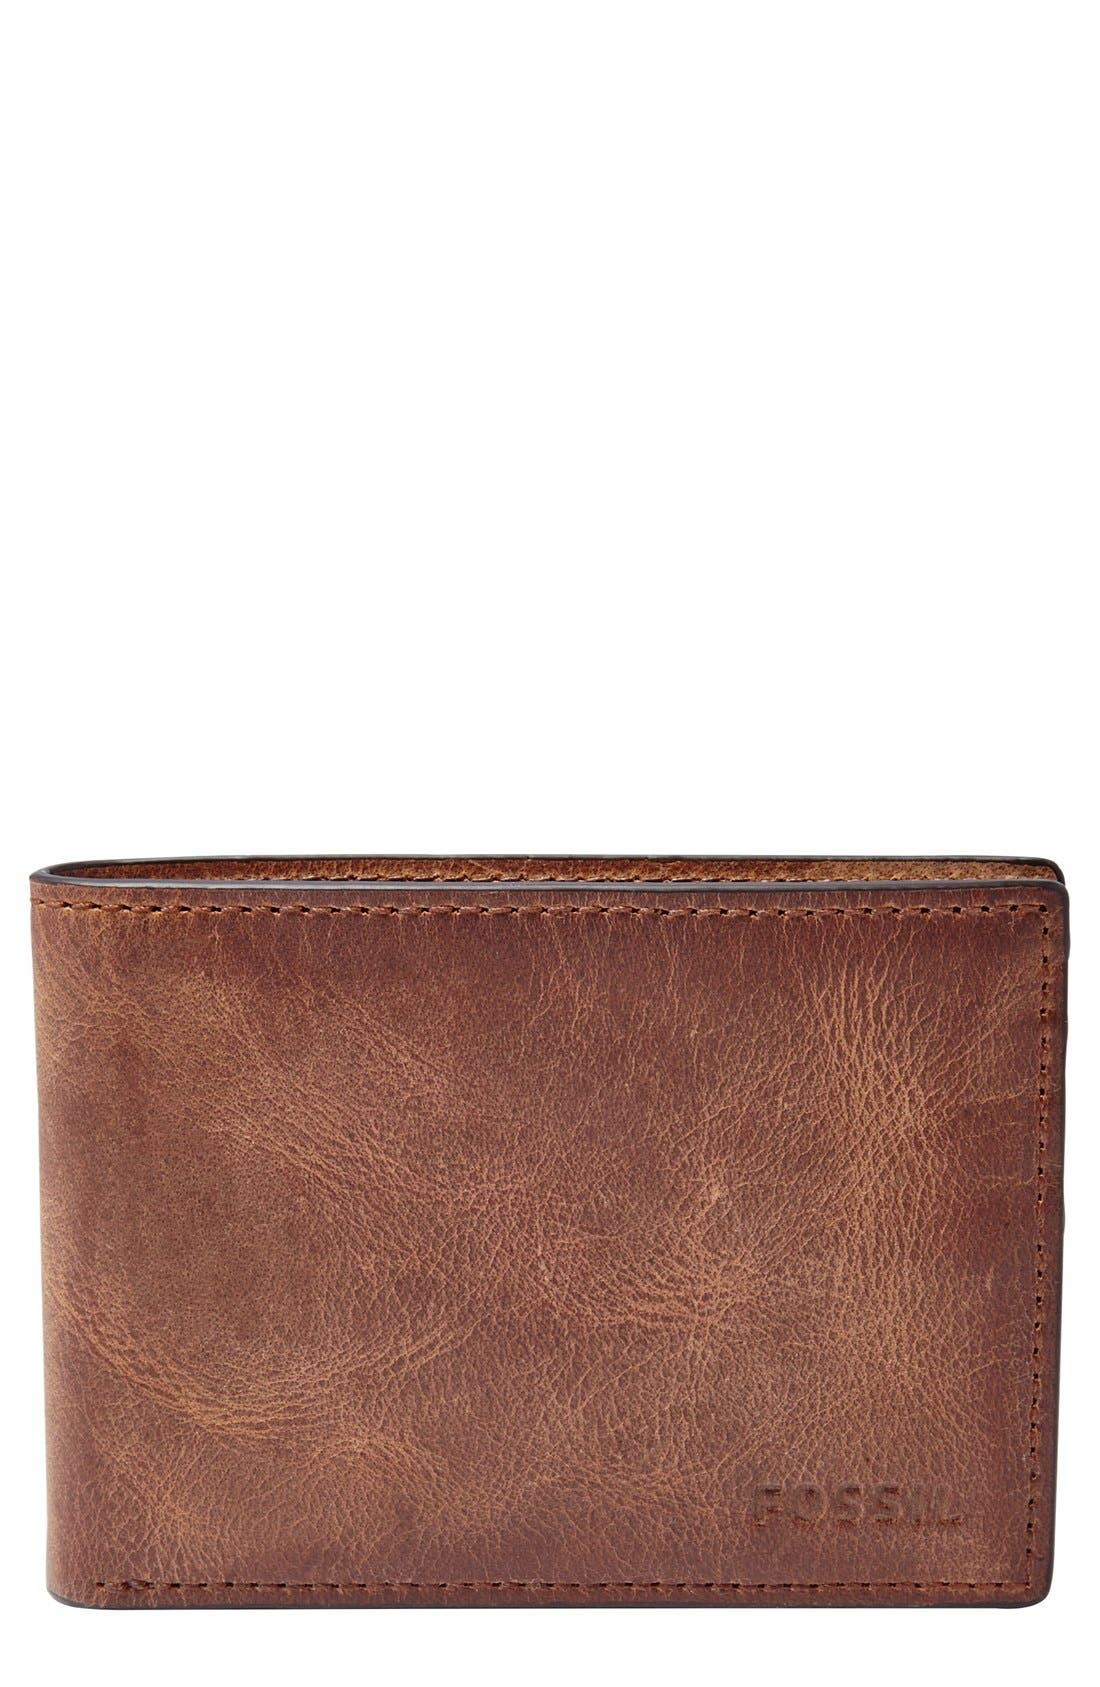 Main Image - Fossil 'Derrick' Leather Front Pocket Bifold Wallet